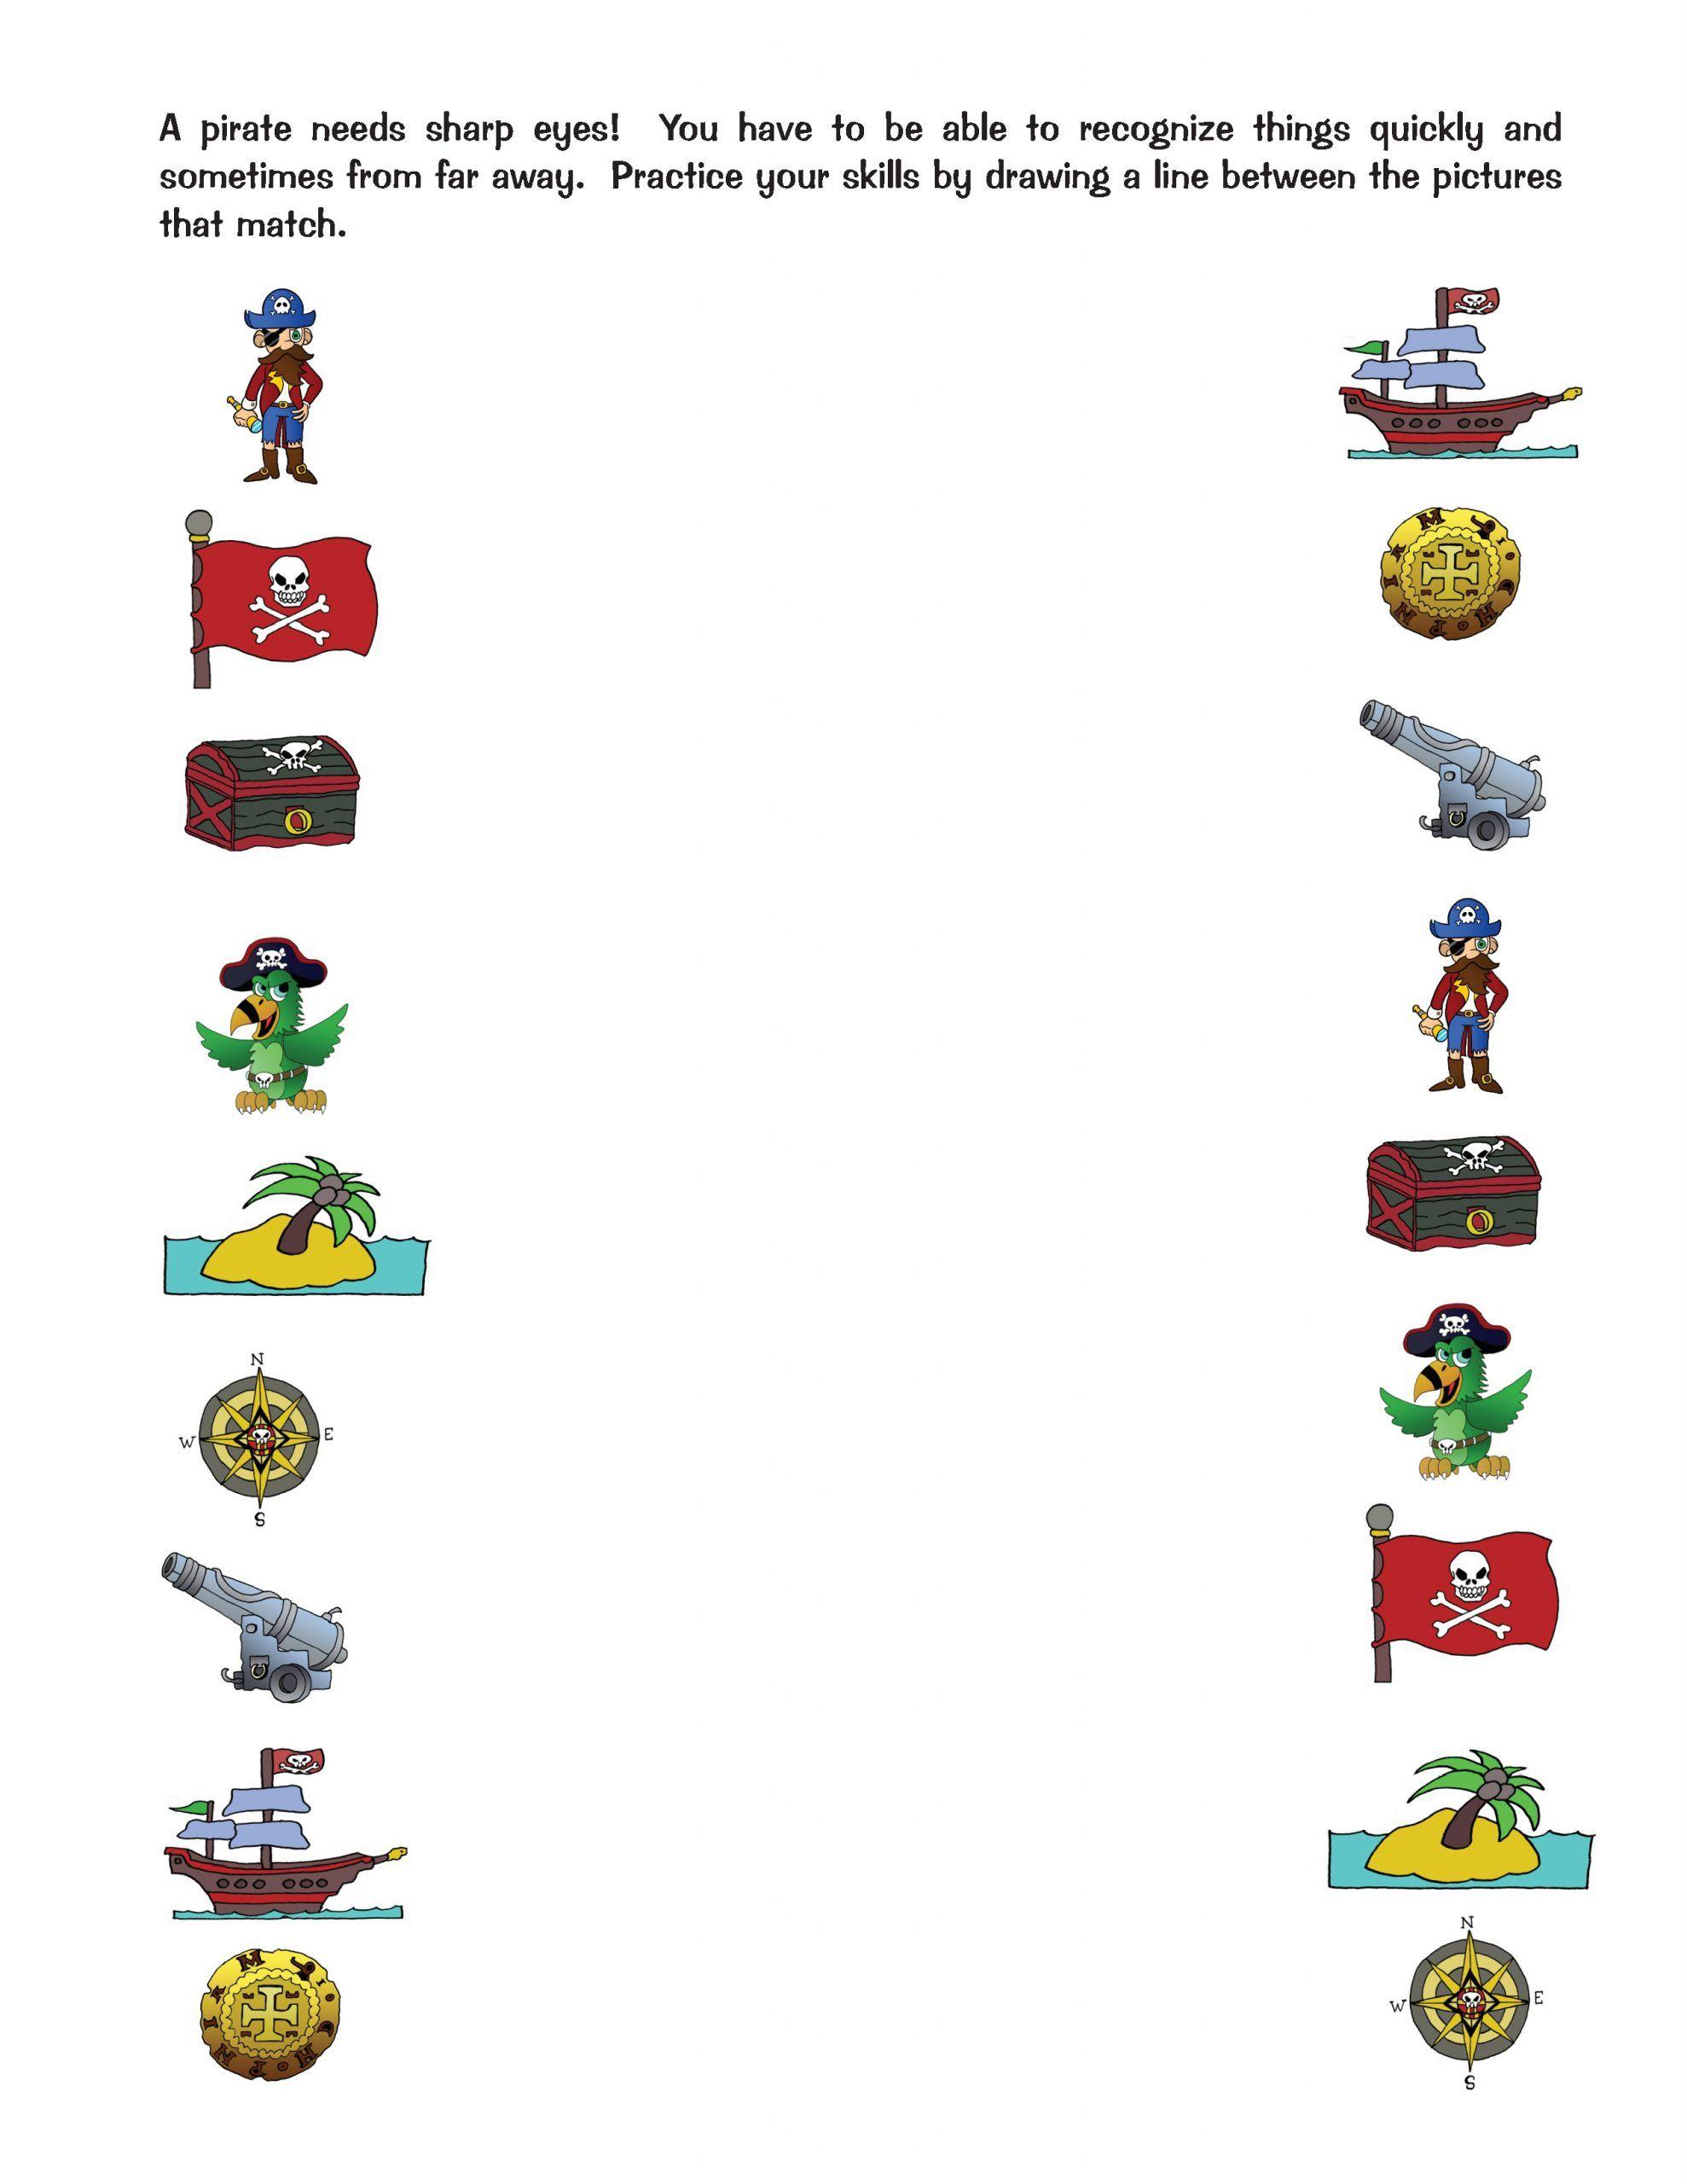 More Pirate Worksheet Fun Kids Story Books Kindergarten Learning Activities Activity Workbook [ 2560 x 1978 Pixel ]